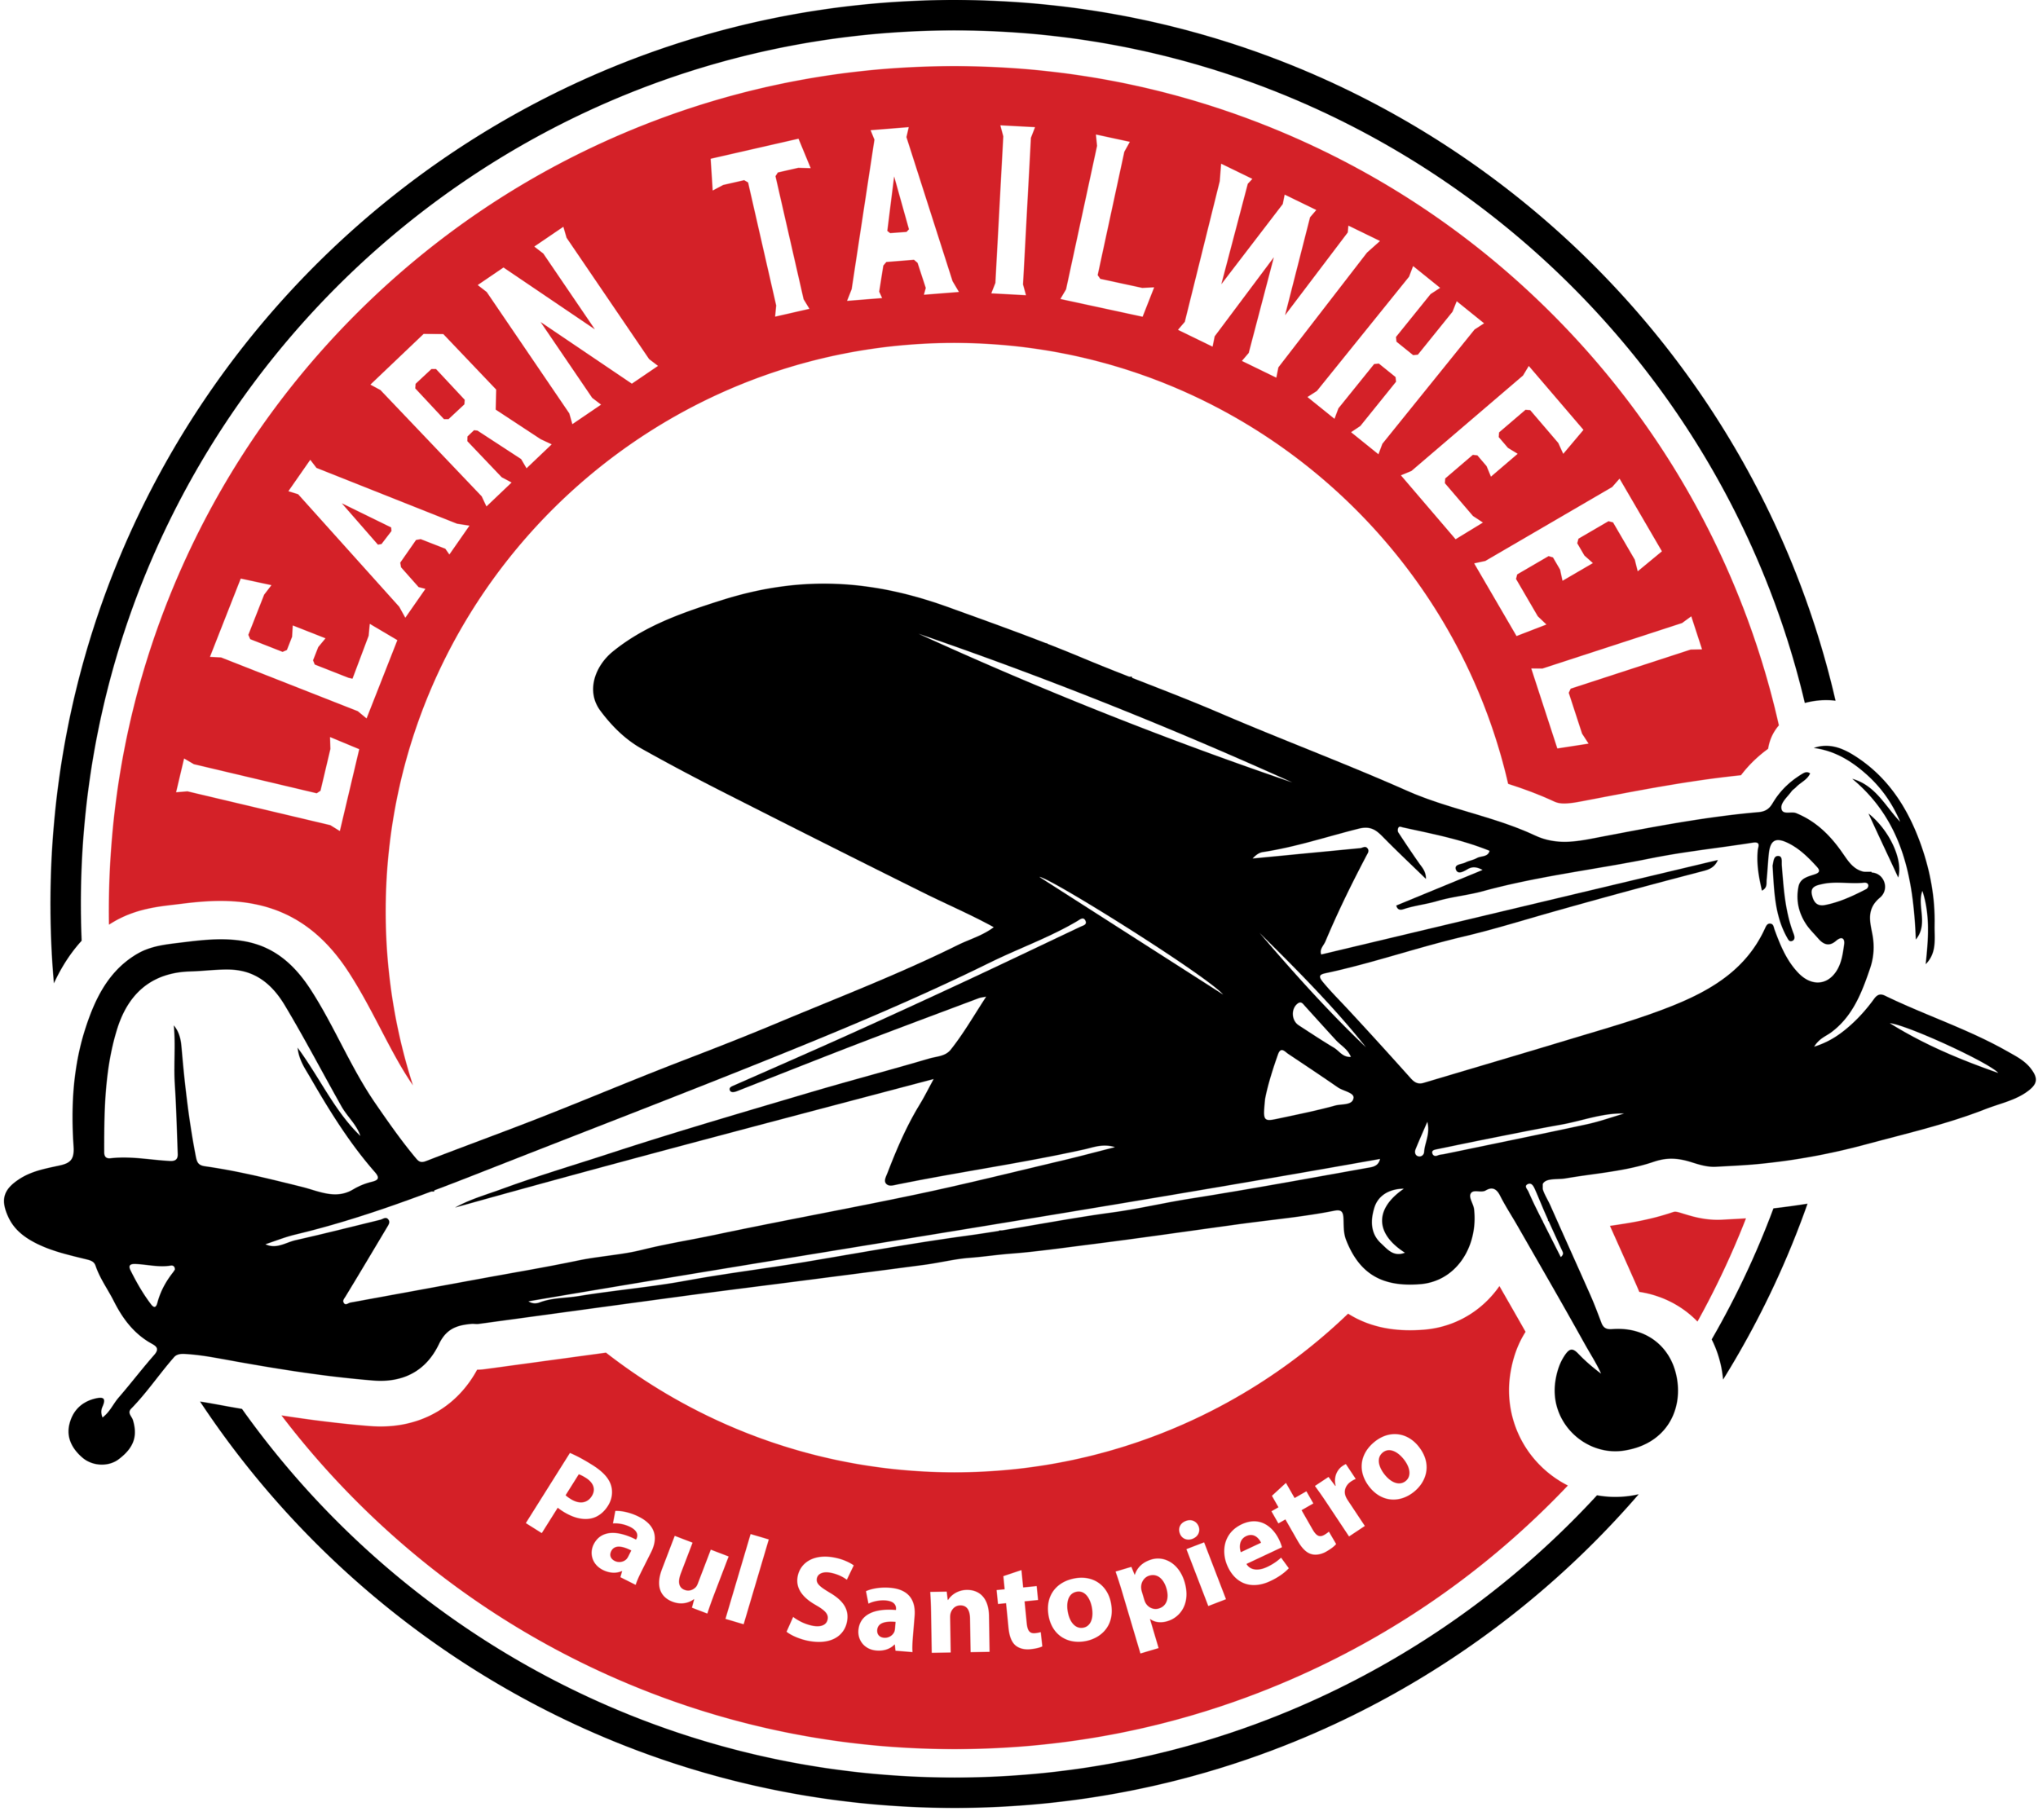 Learn Tailwheel